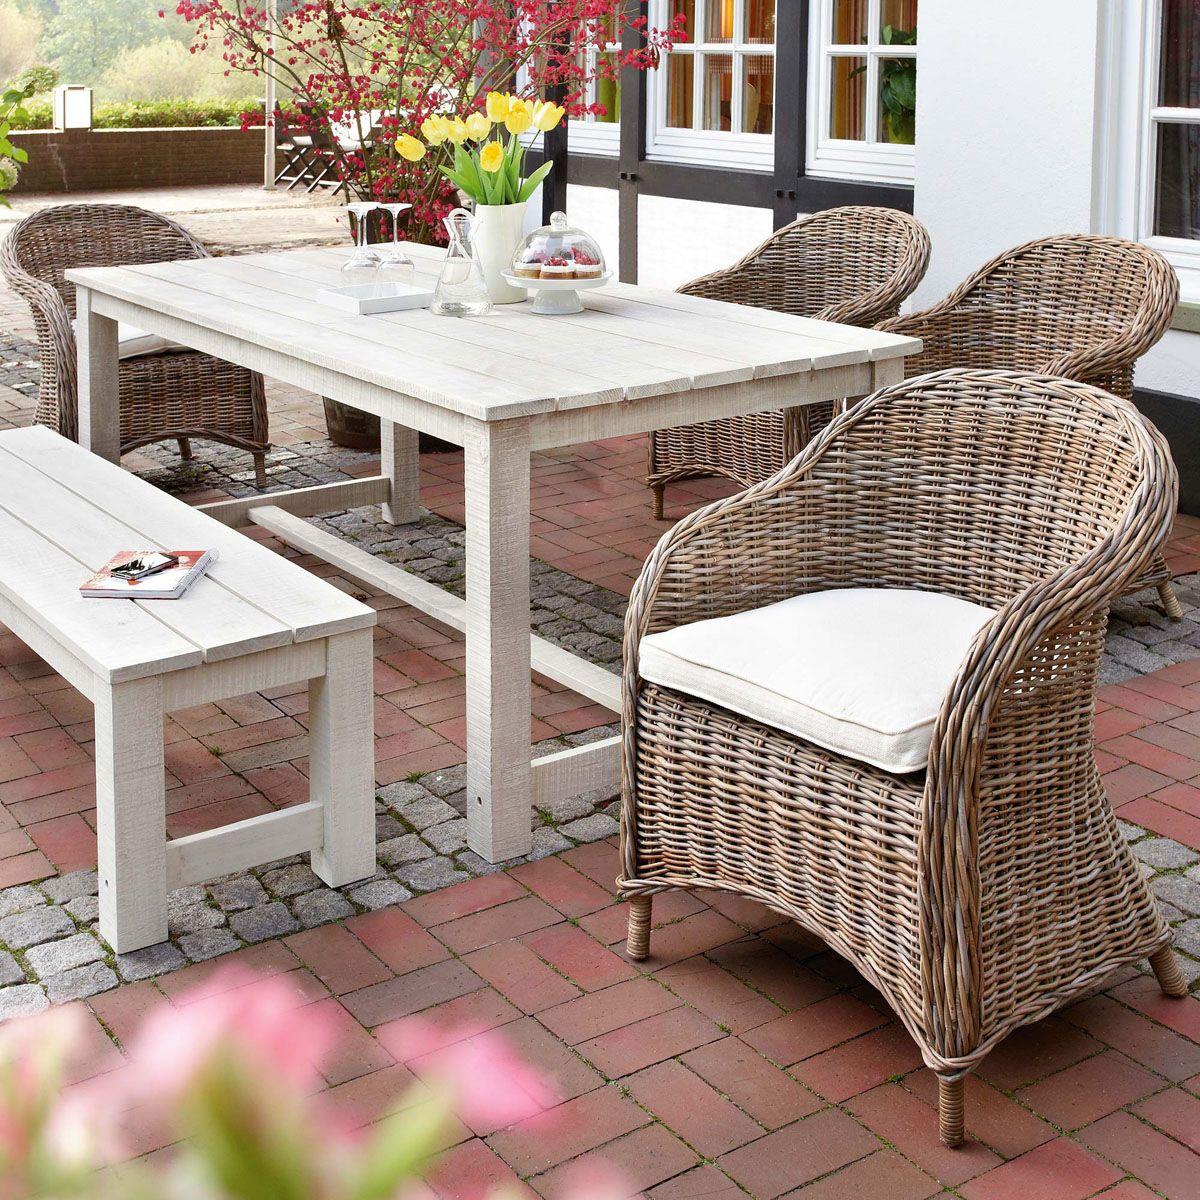 Bamboo Patio Furniture Manufacturers Patio Furniture Sets